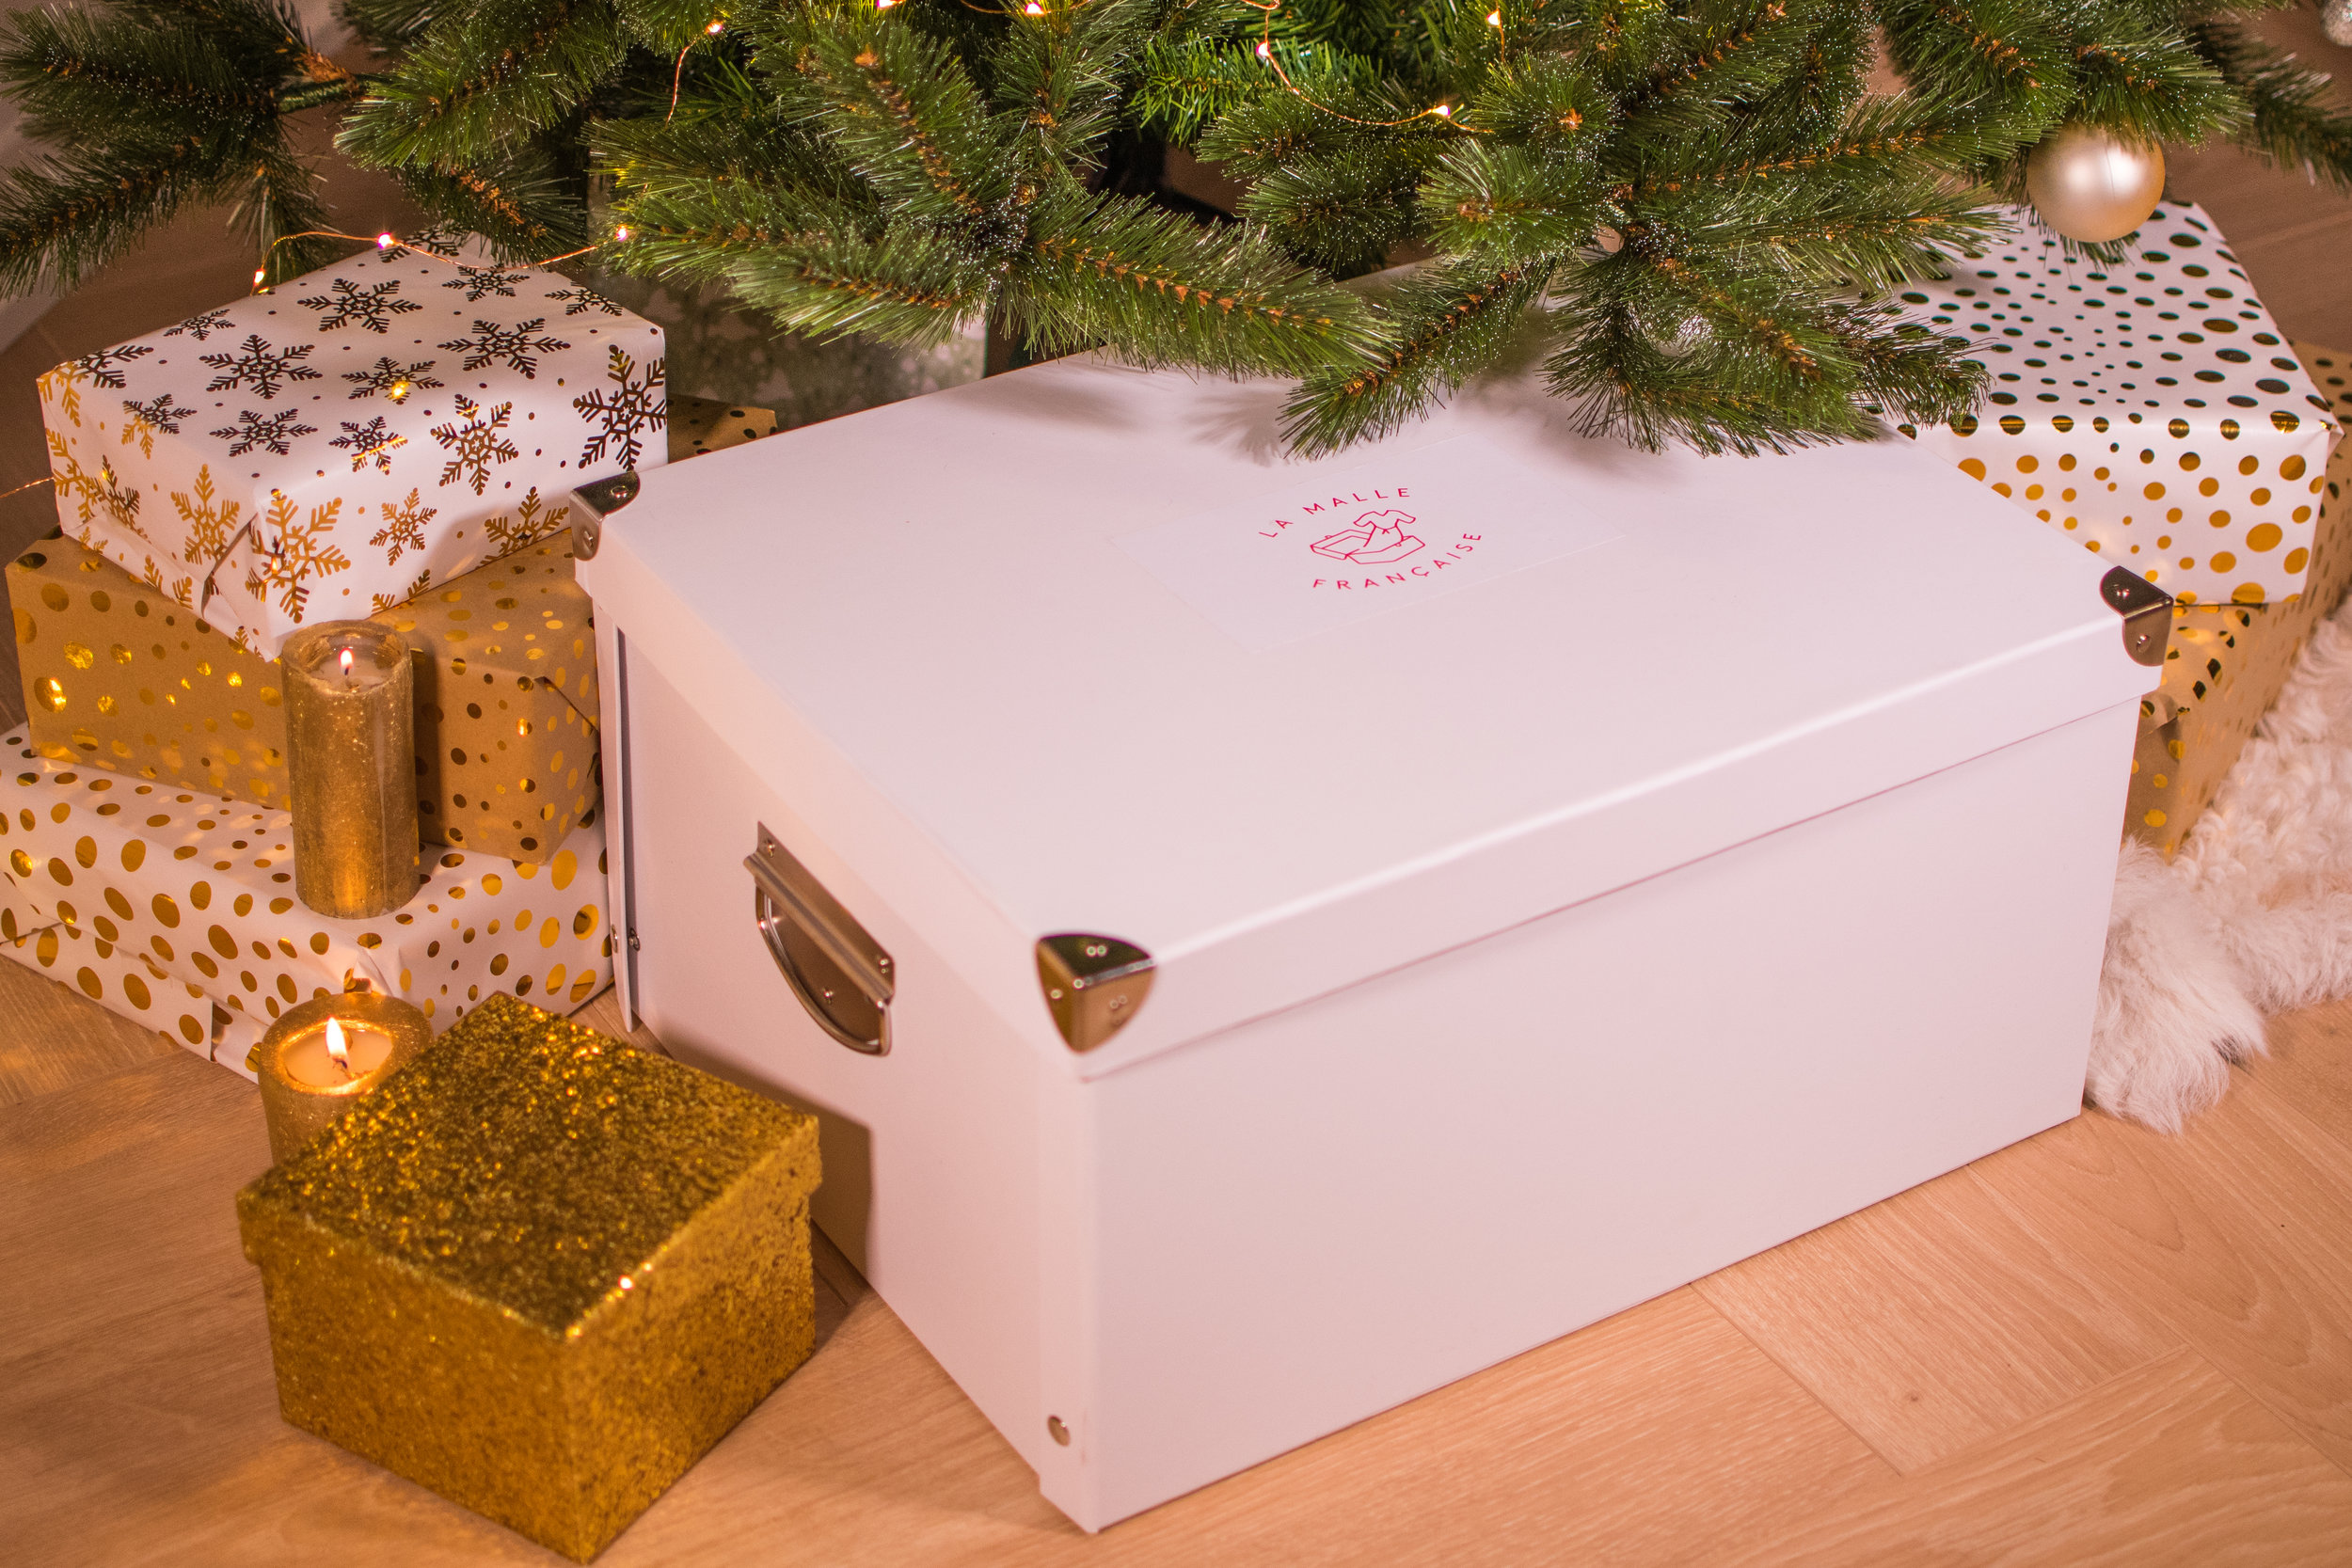 malle, cadeau, noel, carte cadeau, sapin, fêtes, shopping, femme